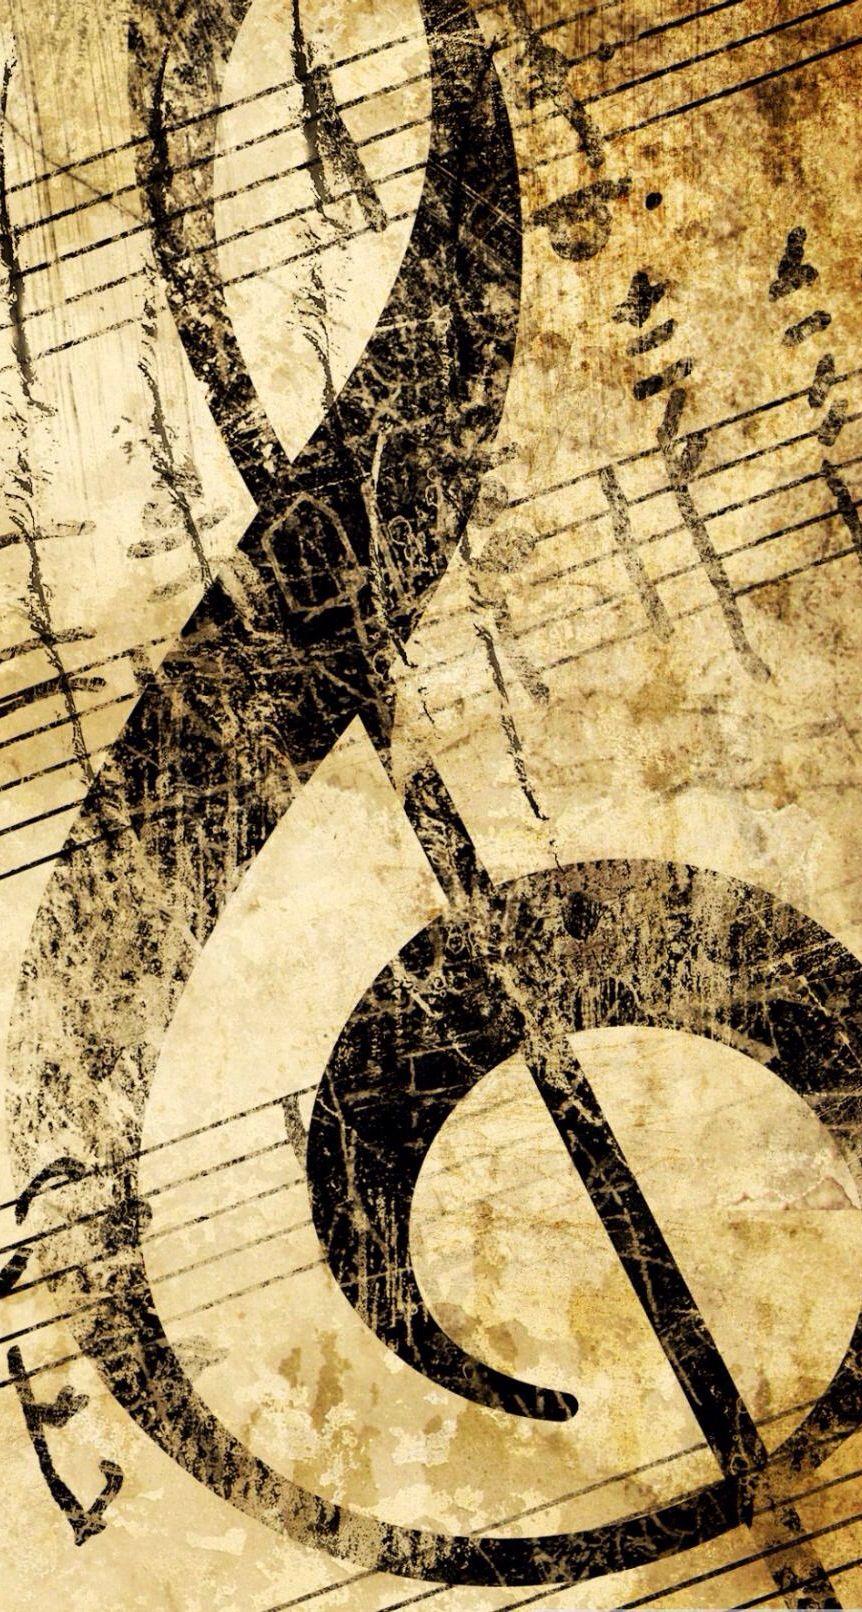 iPhone Wallpaper | Music...the air I breathe | Pinterest | Wallpaper ...